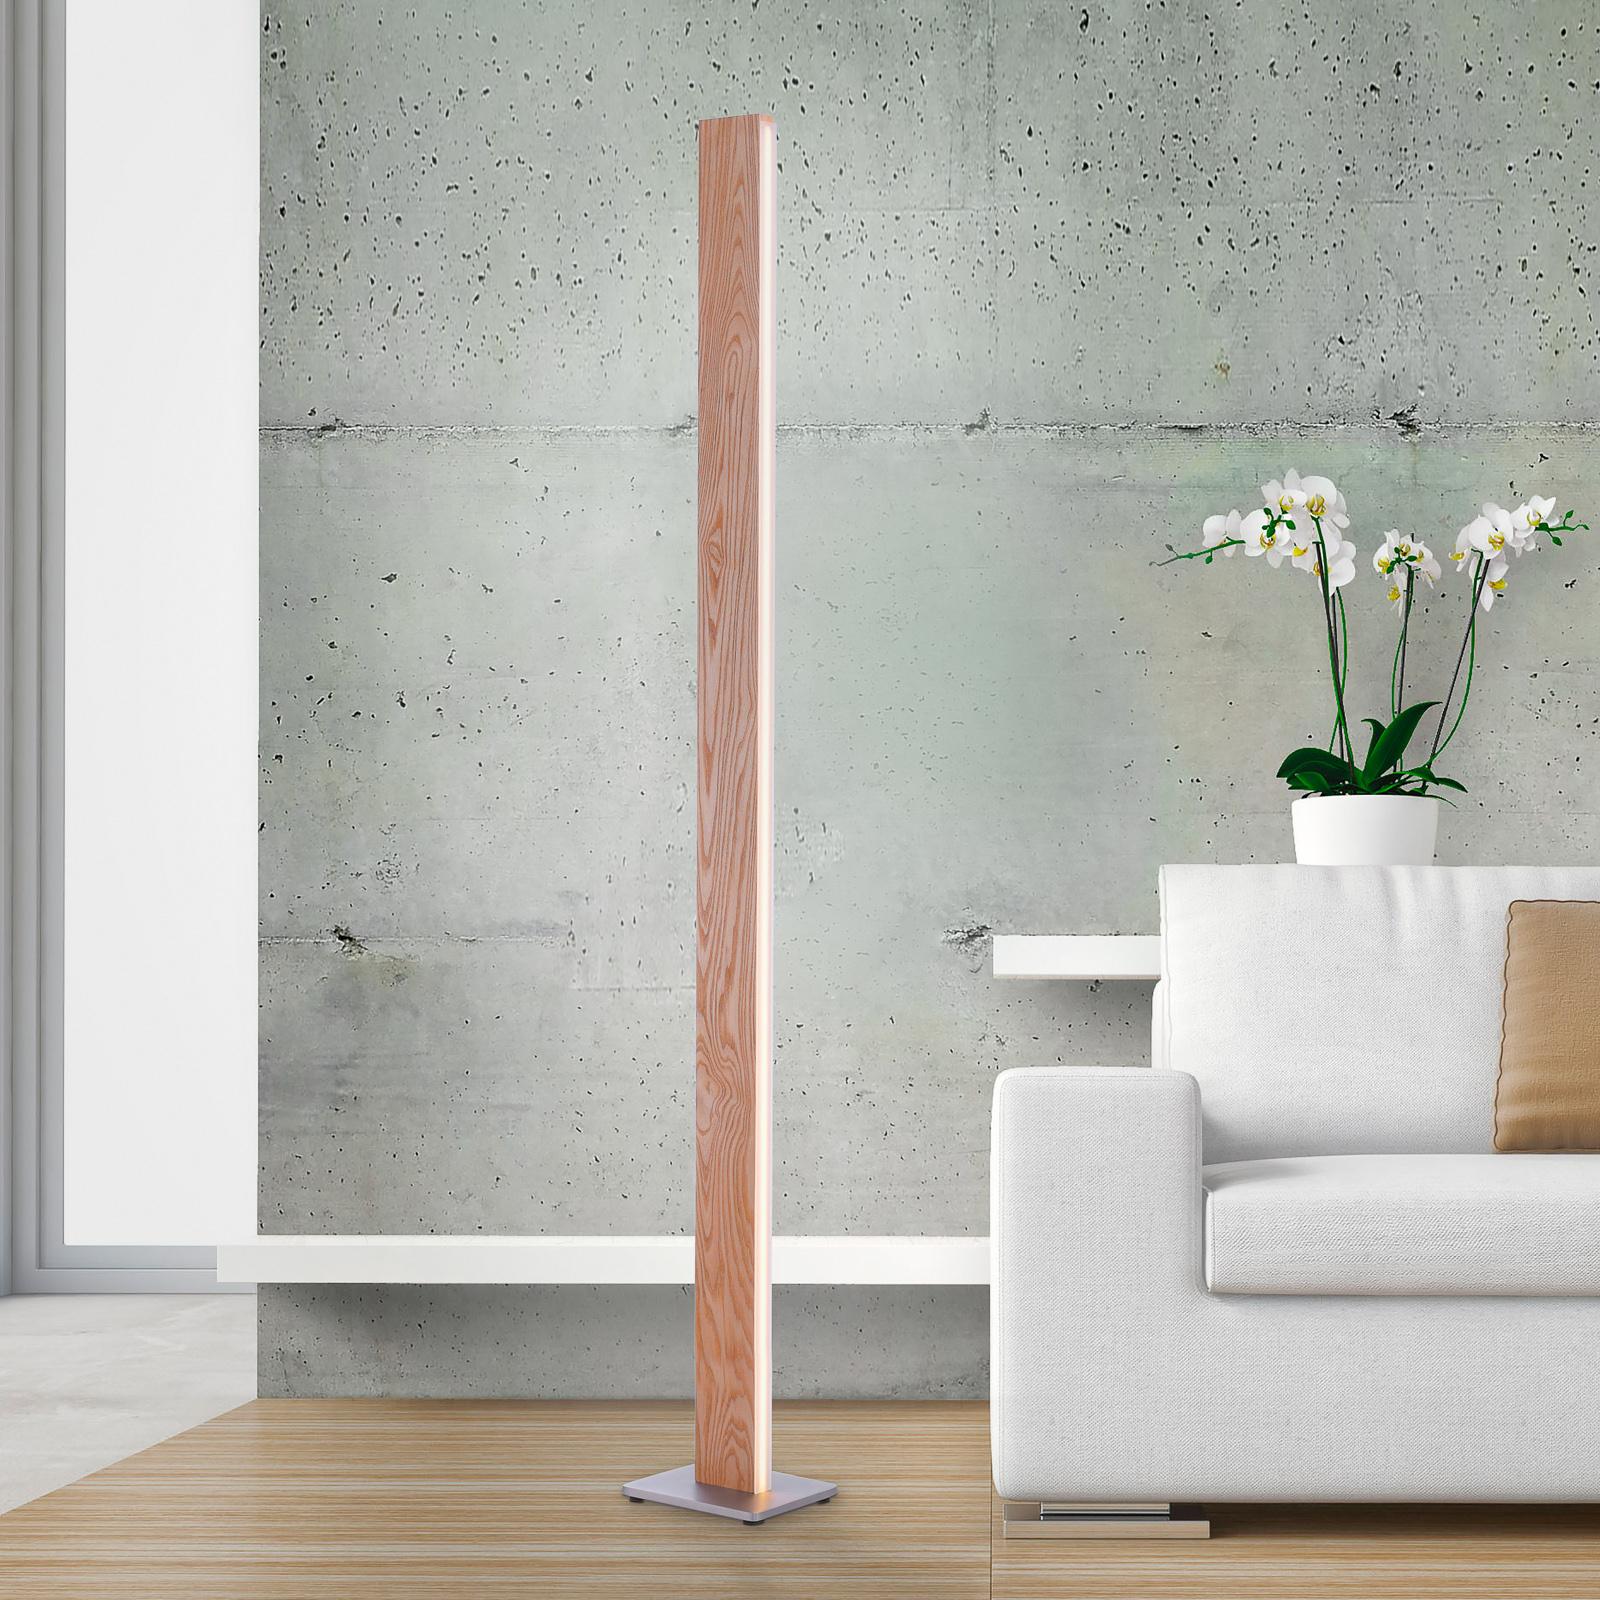 Paul Neuhaus Q-TIMBER LED-gulvlampe med træ